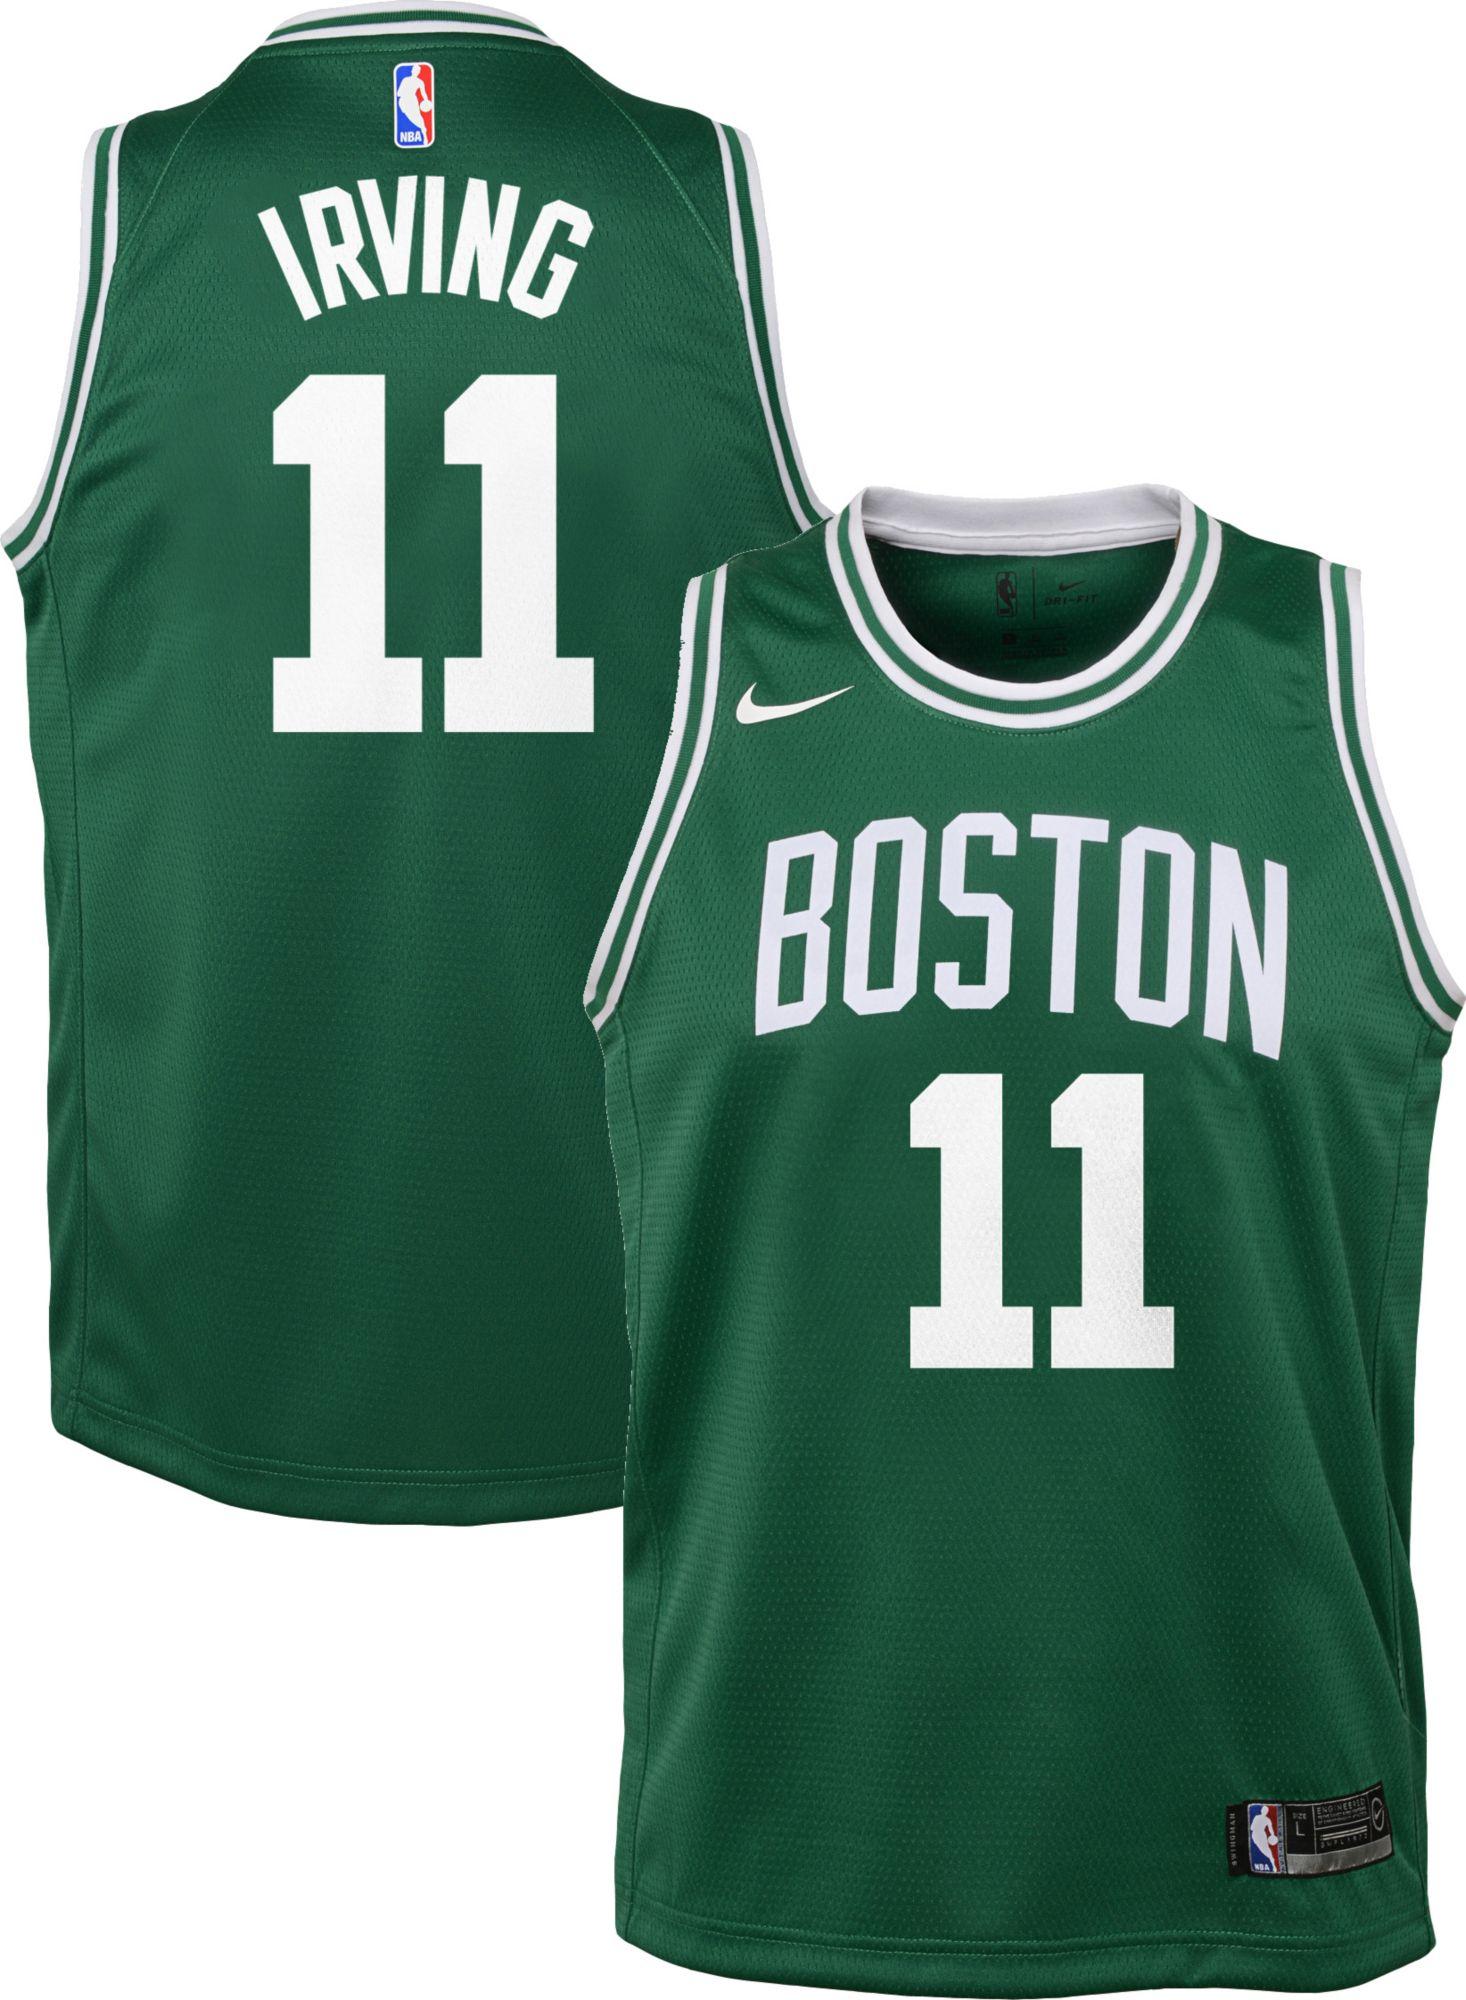 Nike Youth Boston Celtics Kyrie Irving #11 Kelly Green Dri-FIT Swingman  Jersey   DICK'S Sporting Goods